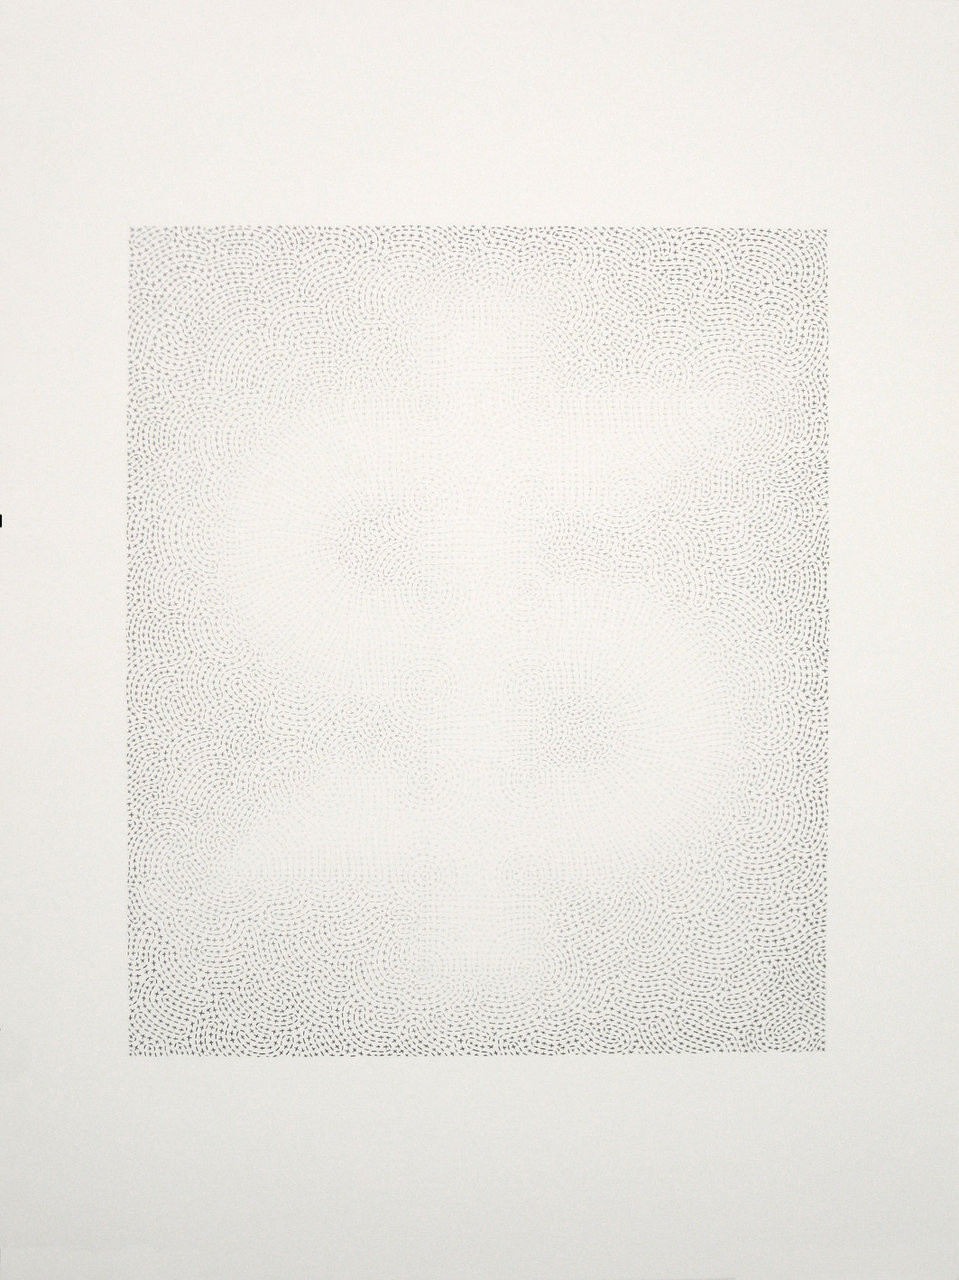 USD, Pencil on paper, 700 mm x 500 mm